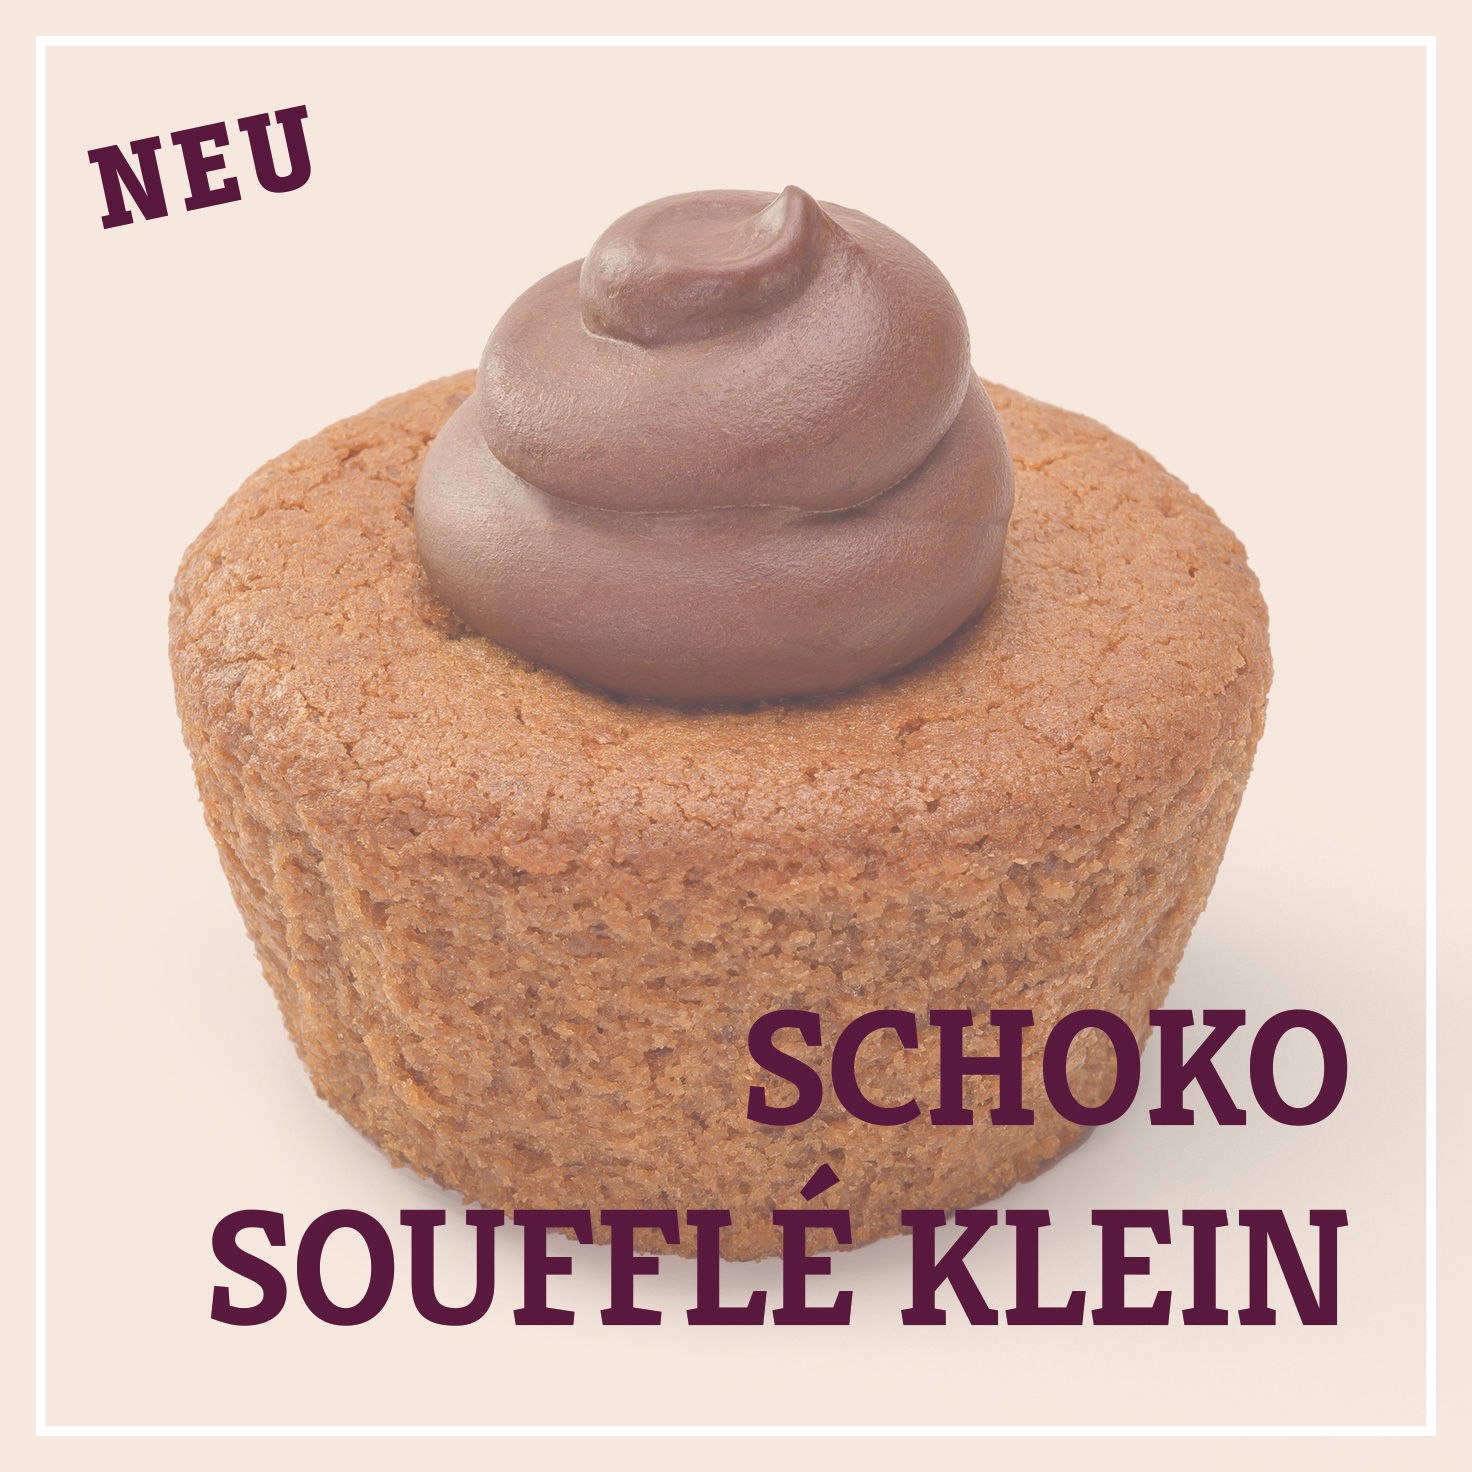 Heiss & Süß - Schokosoufflé klein